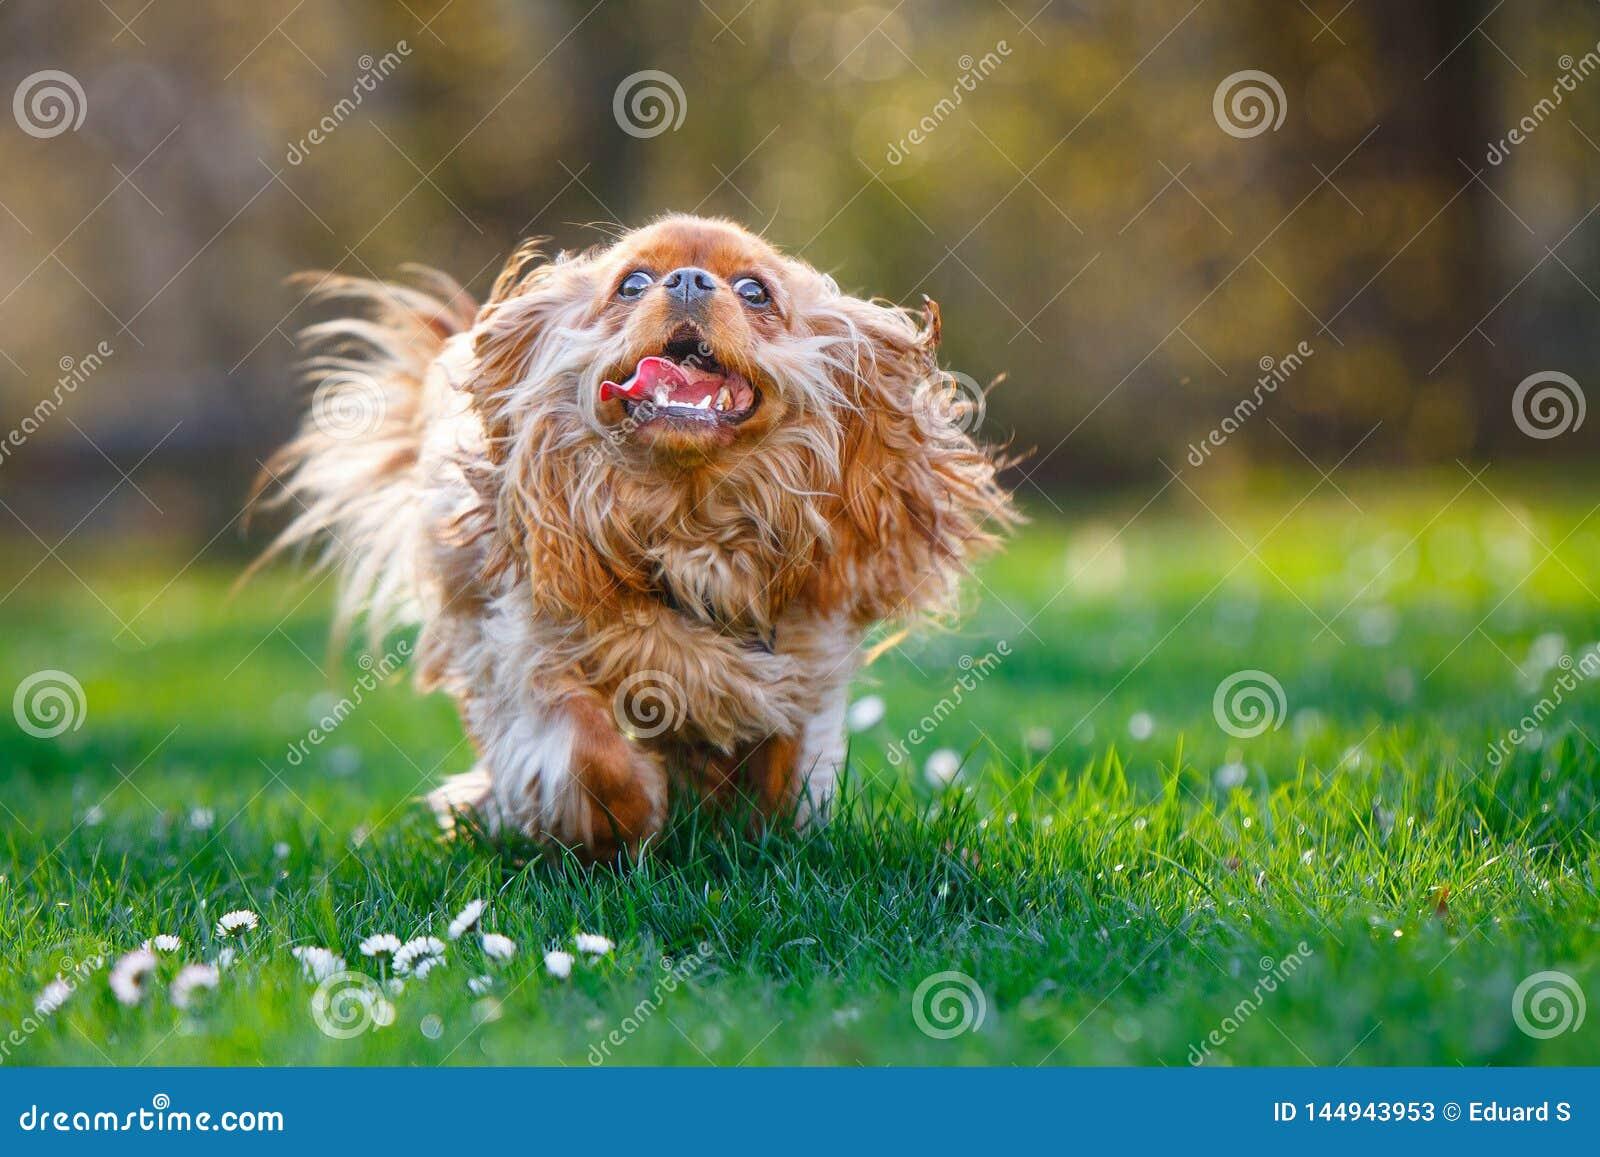 furry ruby cavalier king charles spaniel running outside